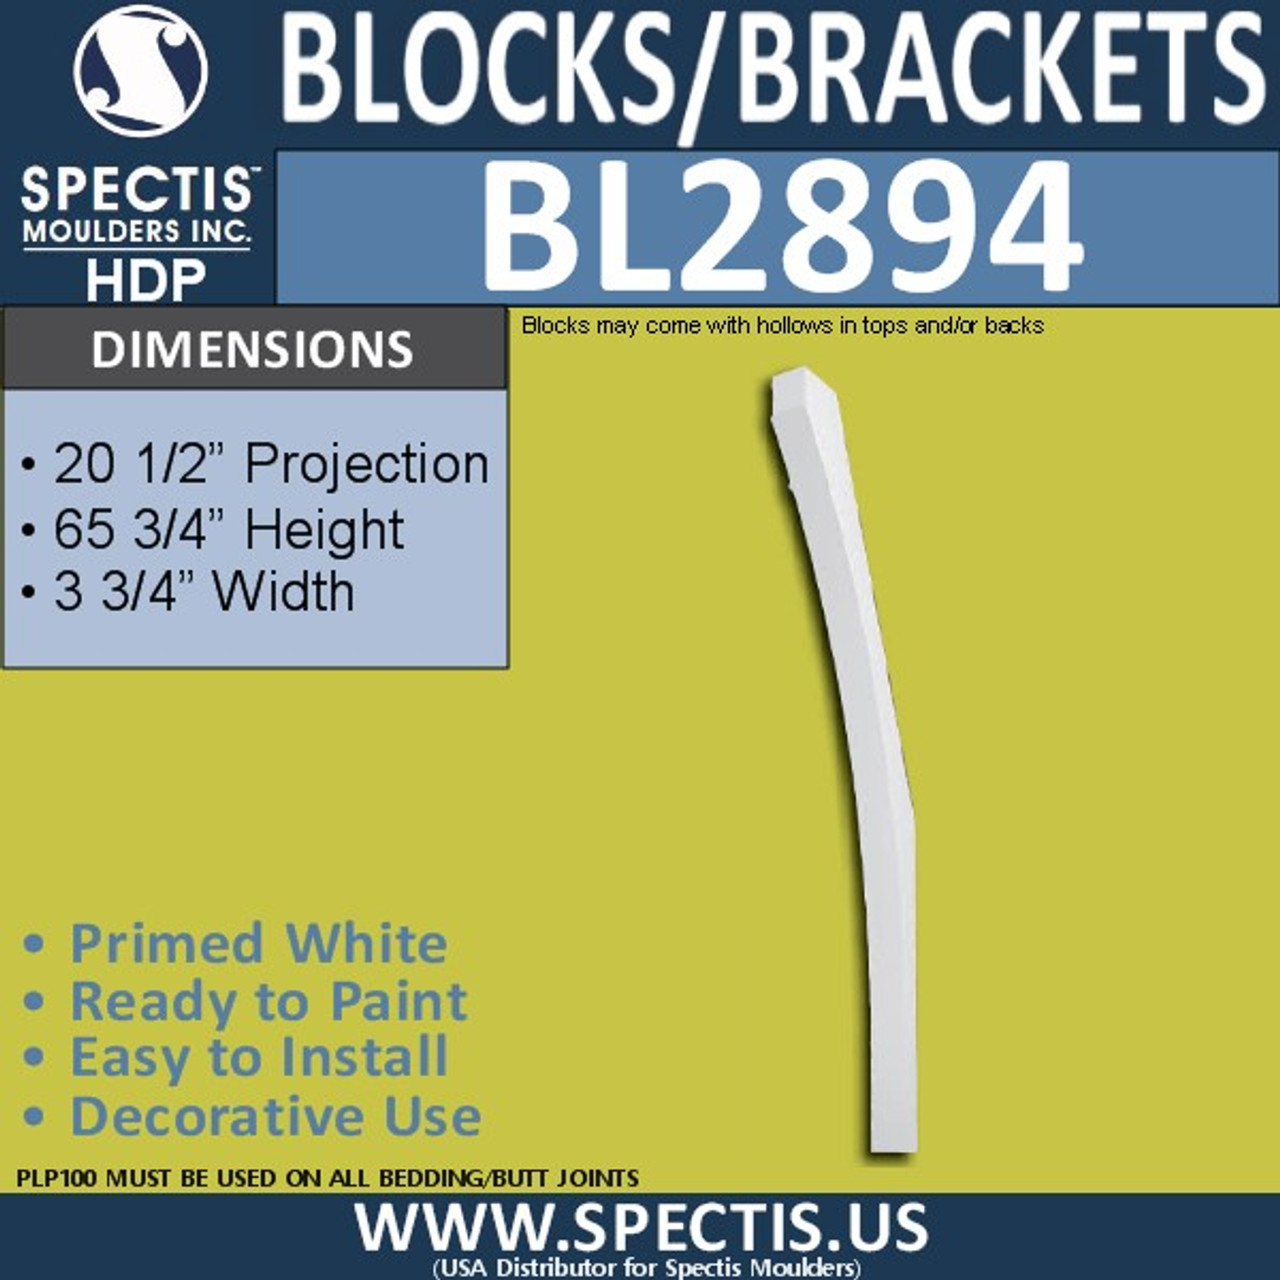 "BL2894 Eave Block or Bracket 3.75""W x 65.75""H x 20.5"" P"